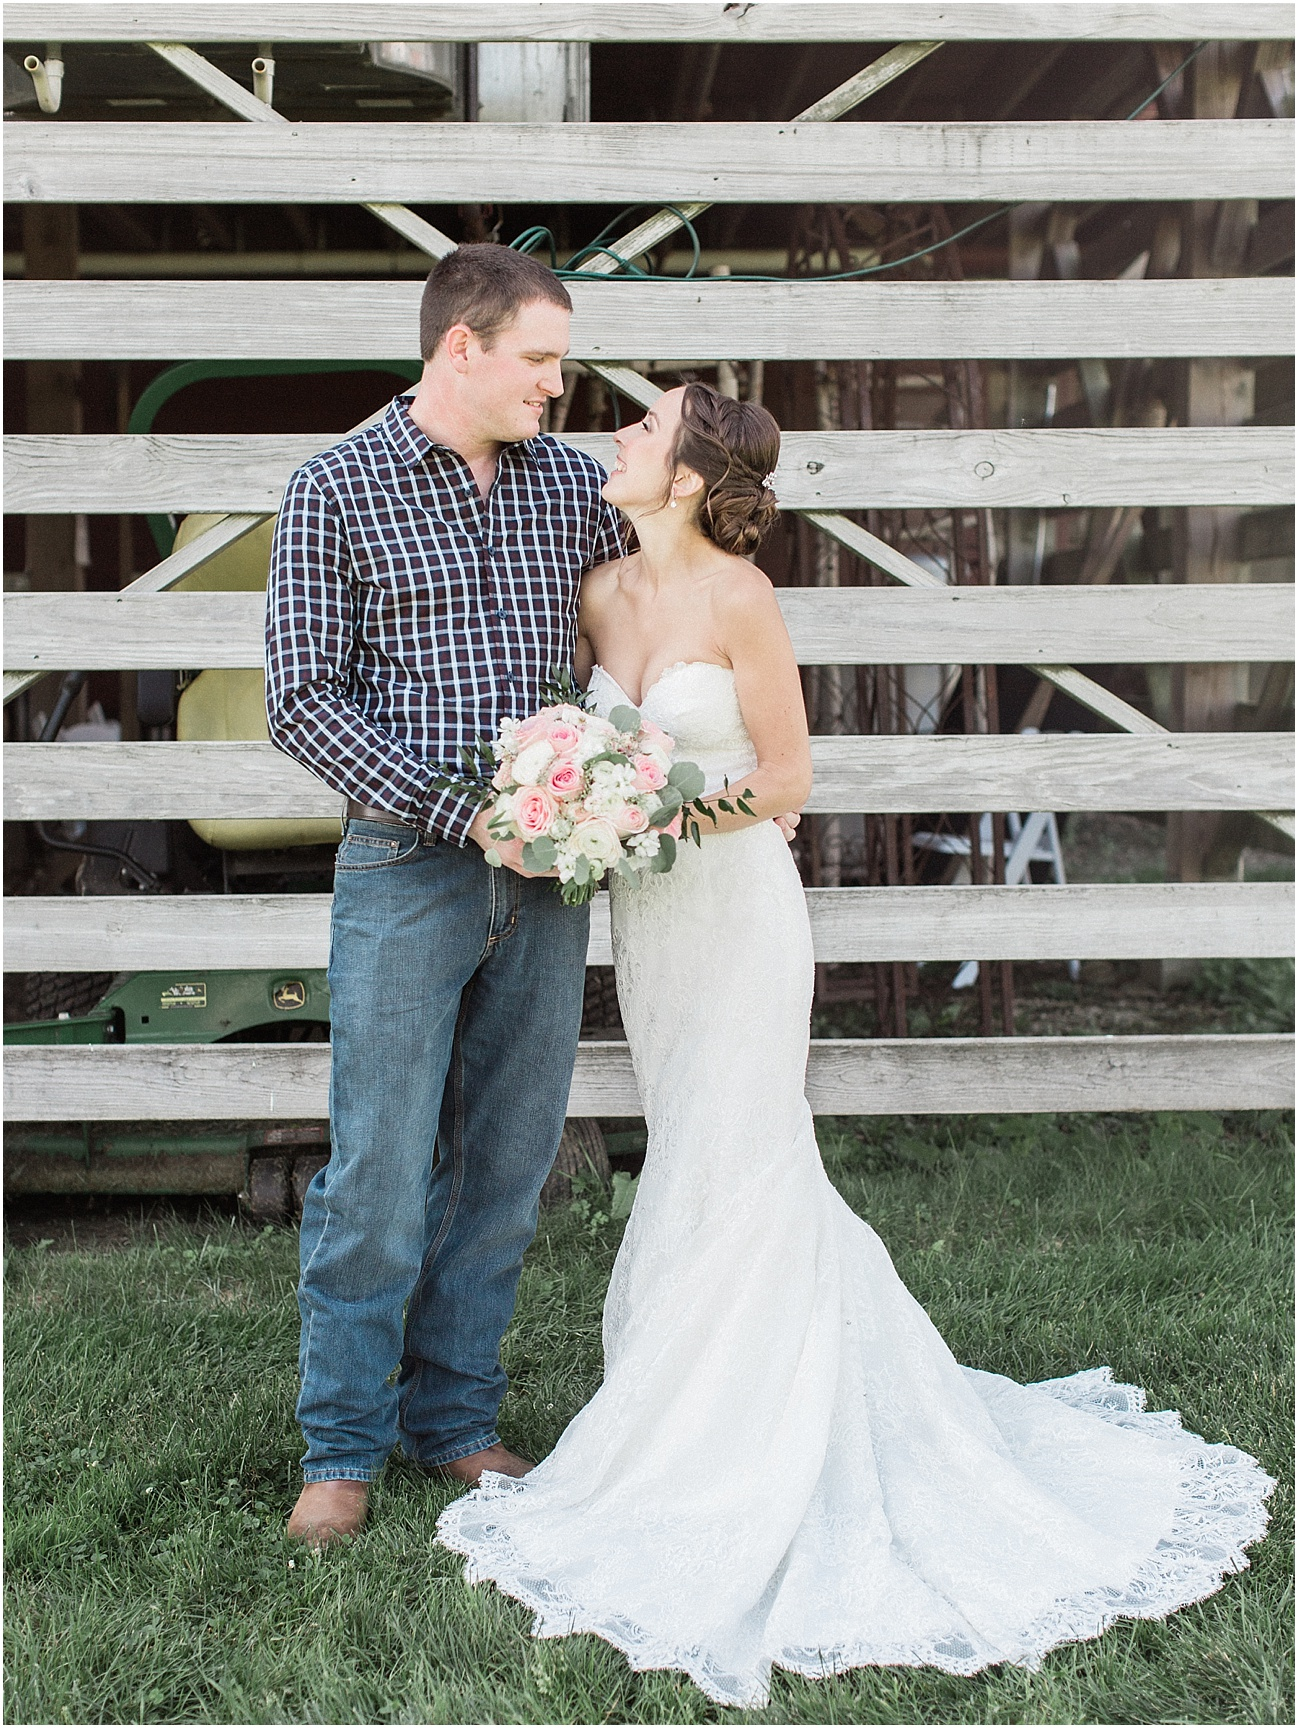 jackie_brad_barn_at_gibbett_hill_country_yellow_lab_fall_burgundy_cape_cod_boston_wedding_photographer_meredith_jane_photography_photo_1015.jpg